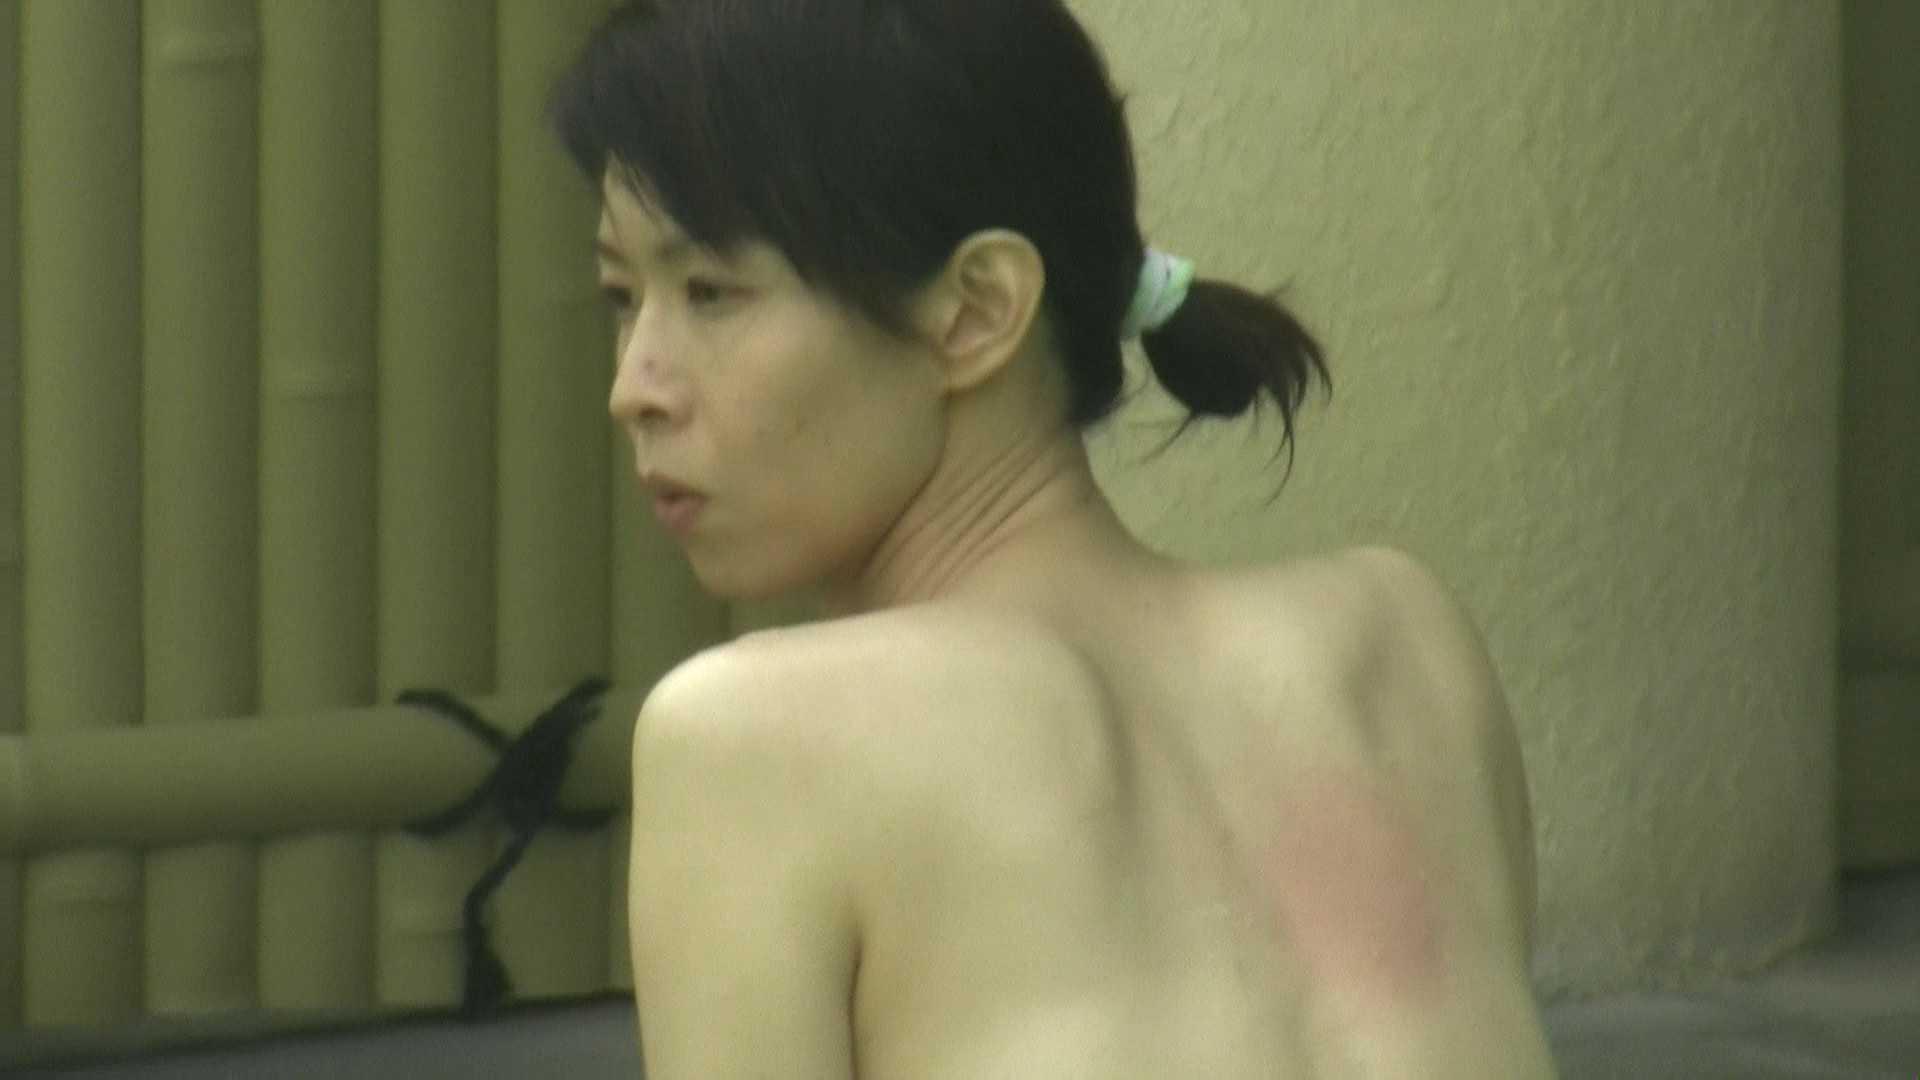 Aquaな露天風呂Vol.631 盗撮  109連発 68